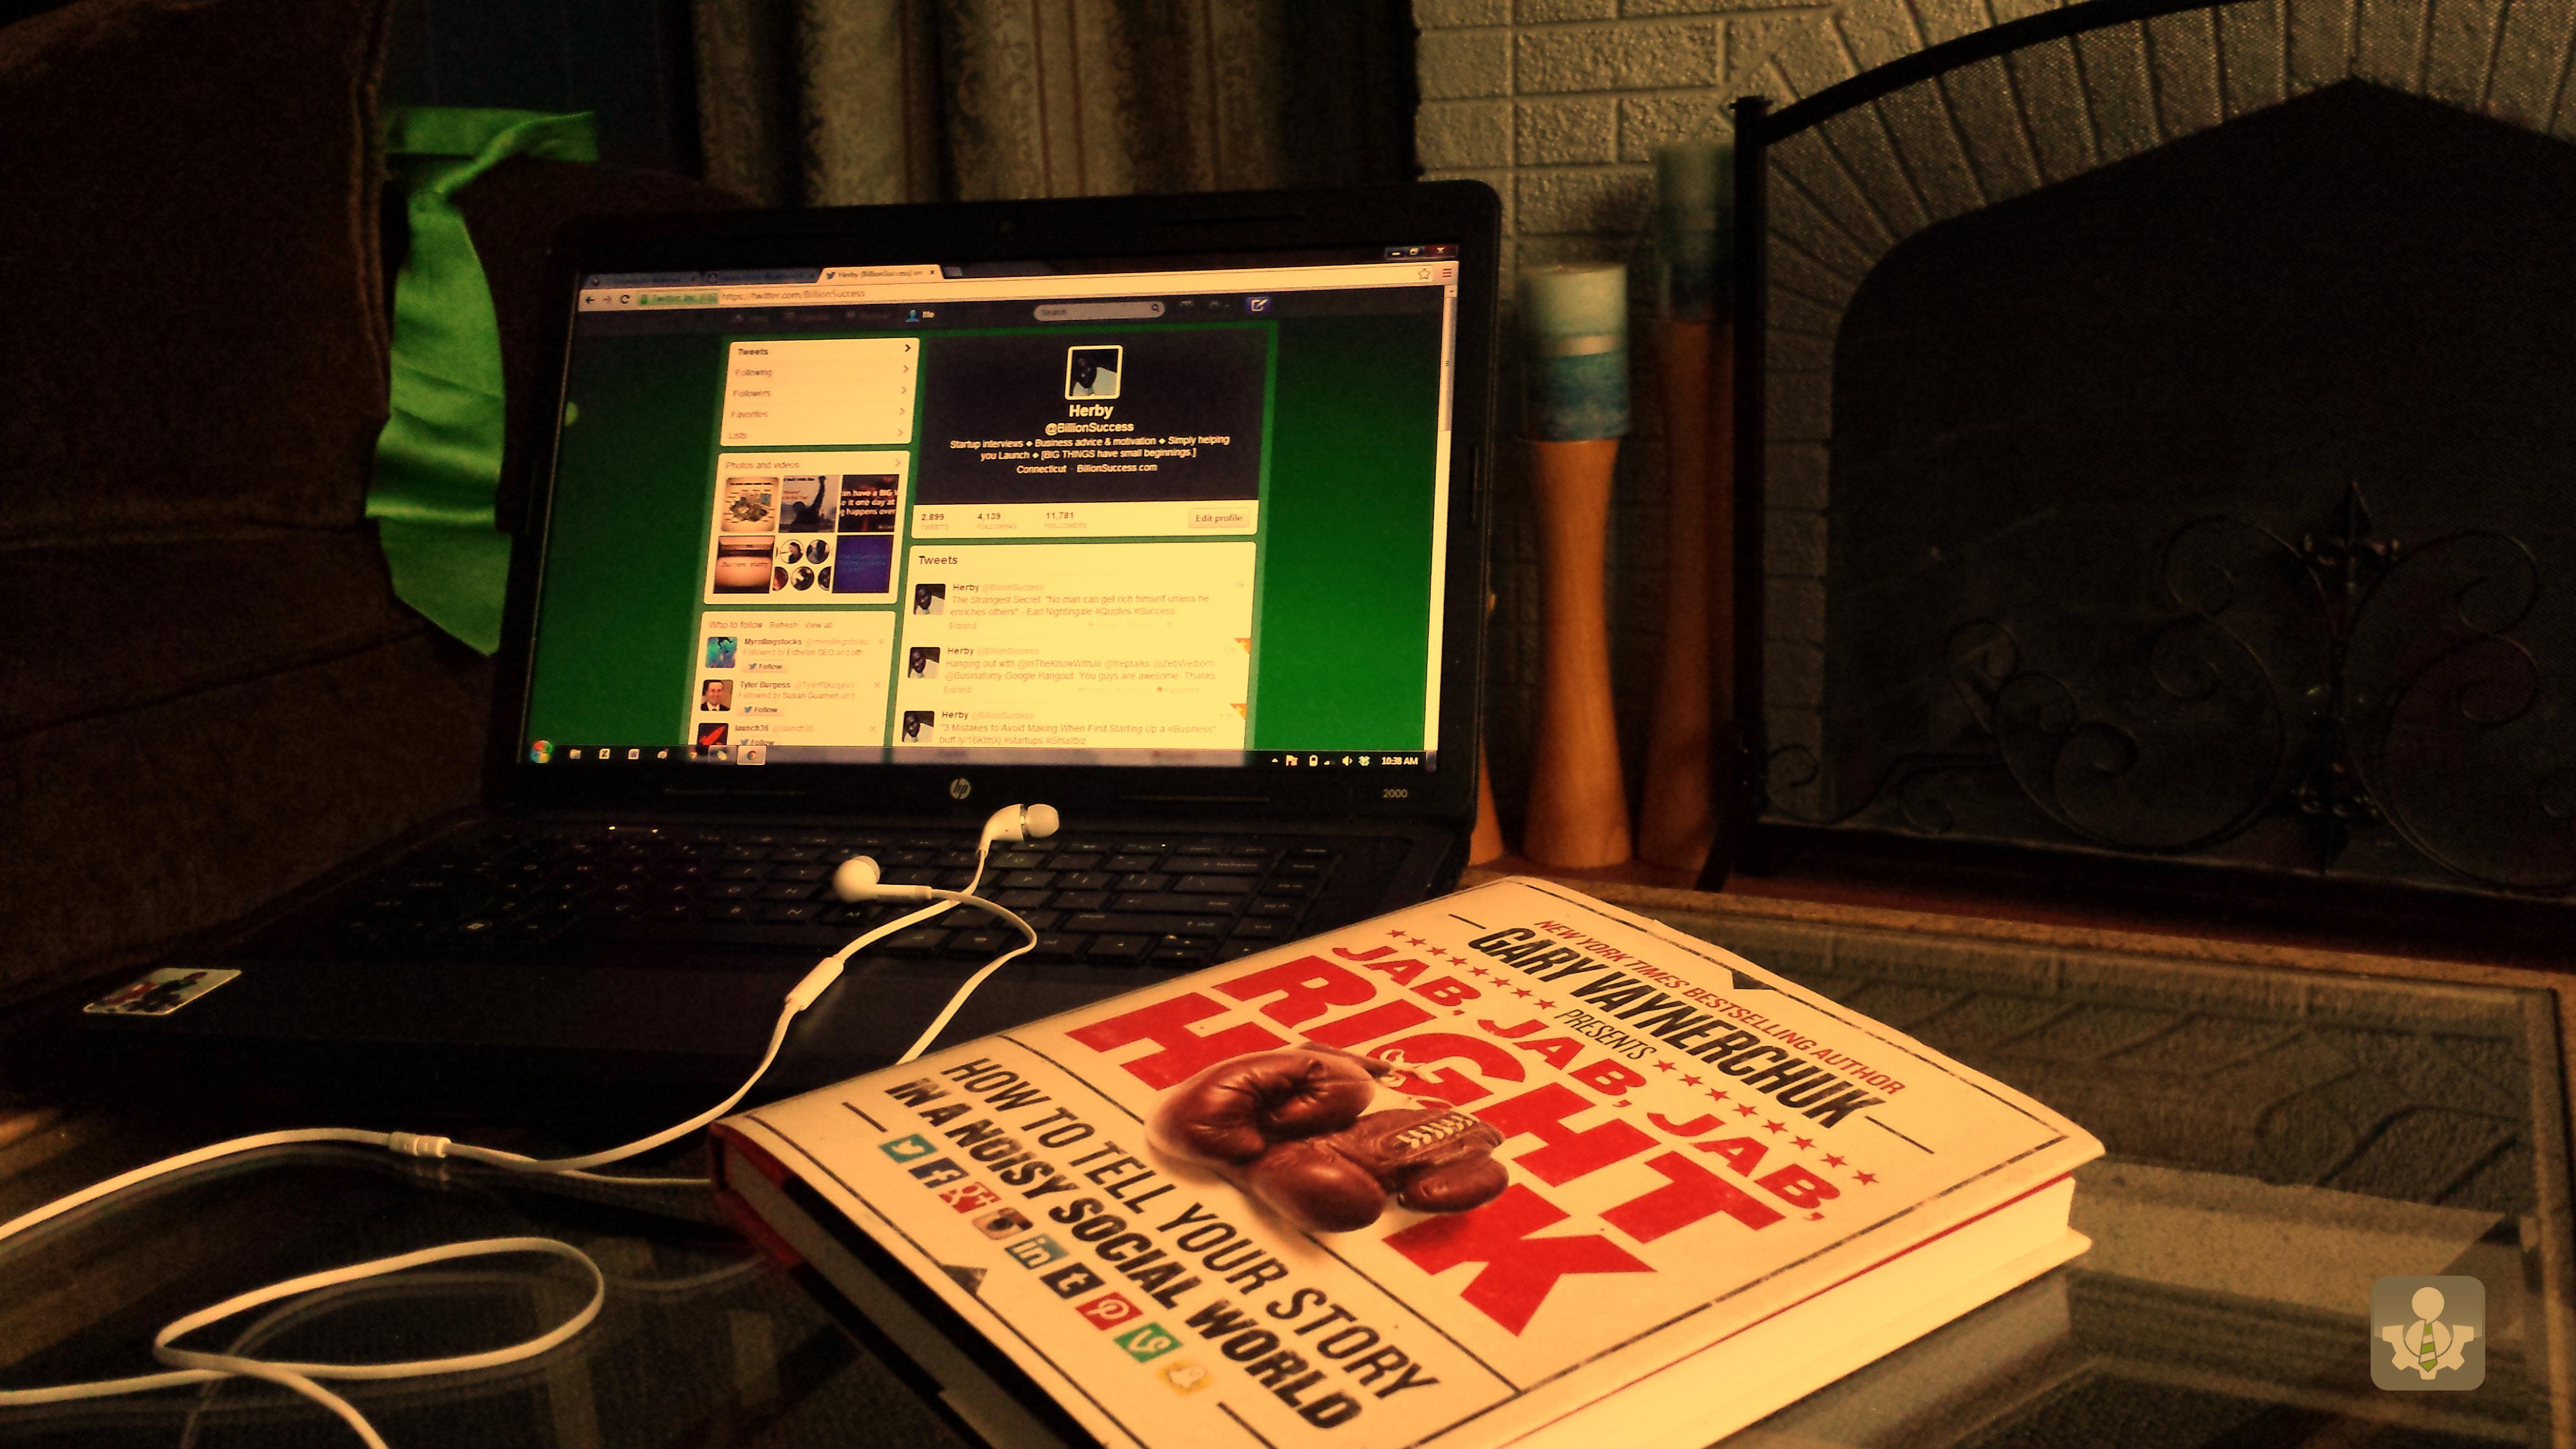 @herbyfabius 3 Lessons Learned from Meeting Gary Vaynerchuk (@GaryVee) at @ThePhatStartup